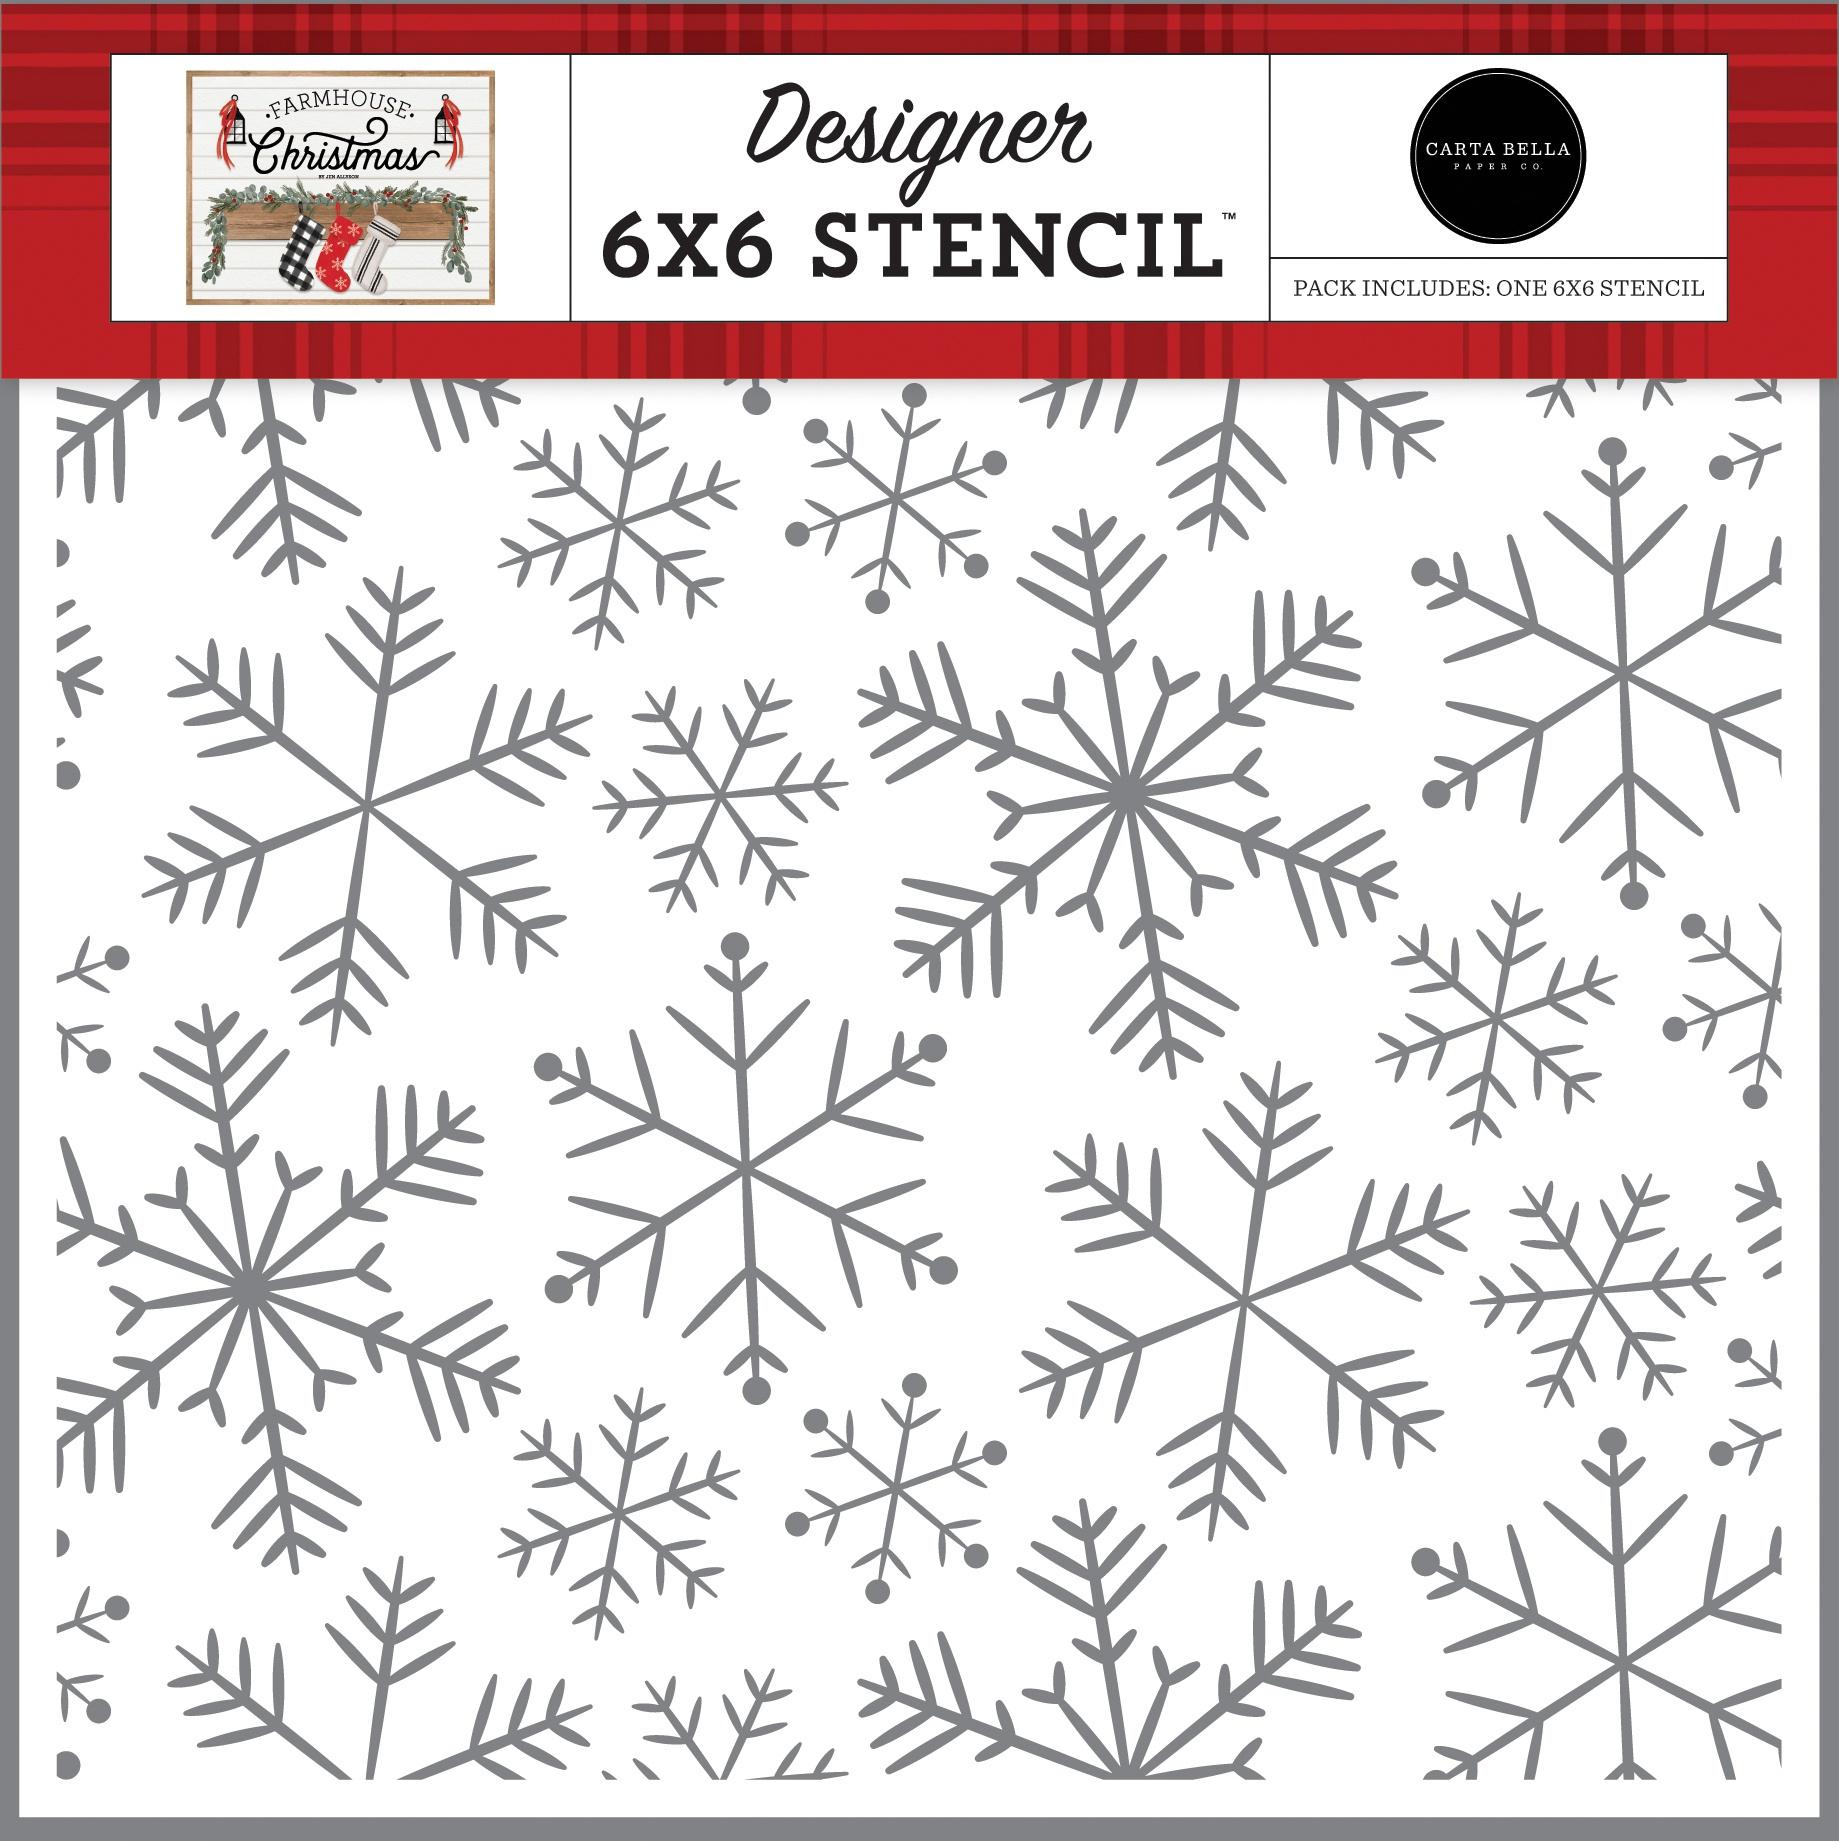 Carta Bella Stencil 6X6-Merry Snowflakes, Farmhouse Christmas